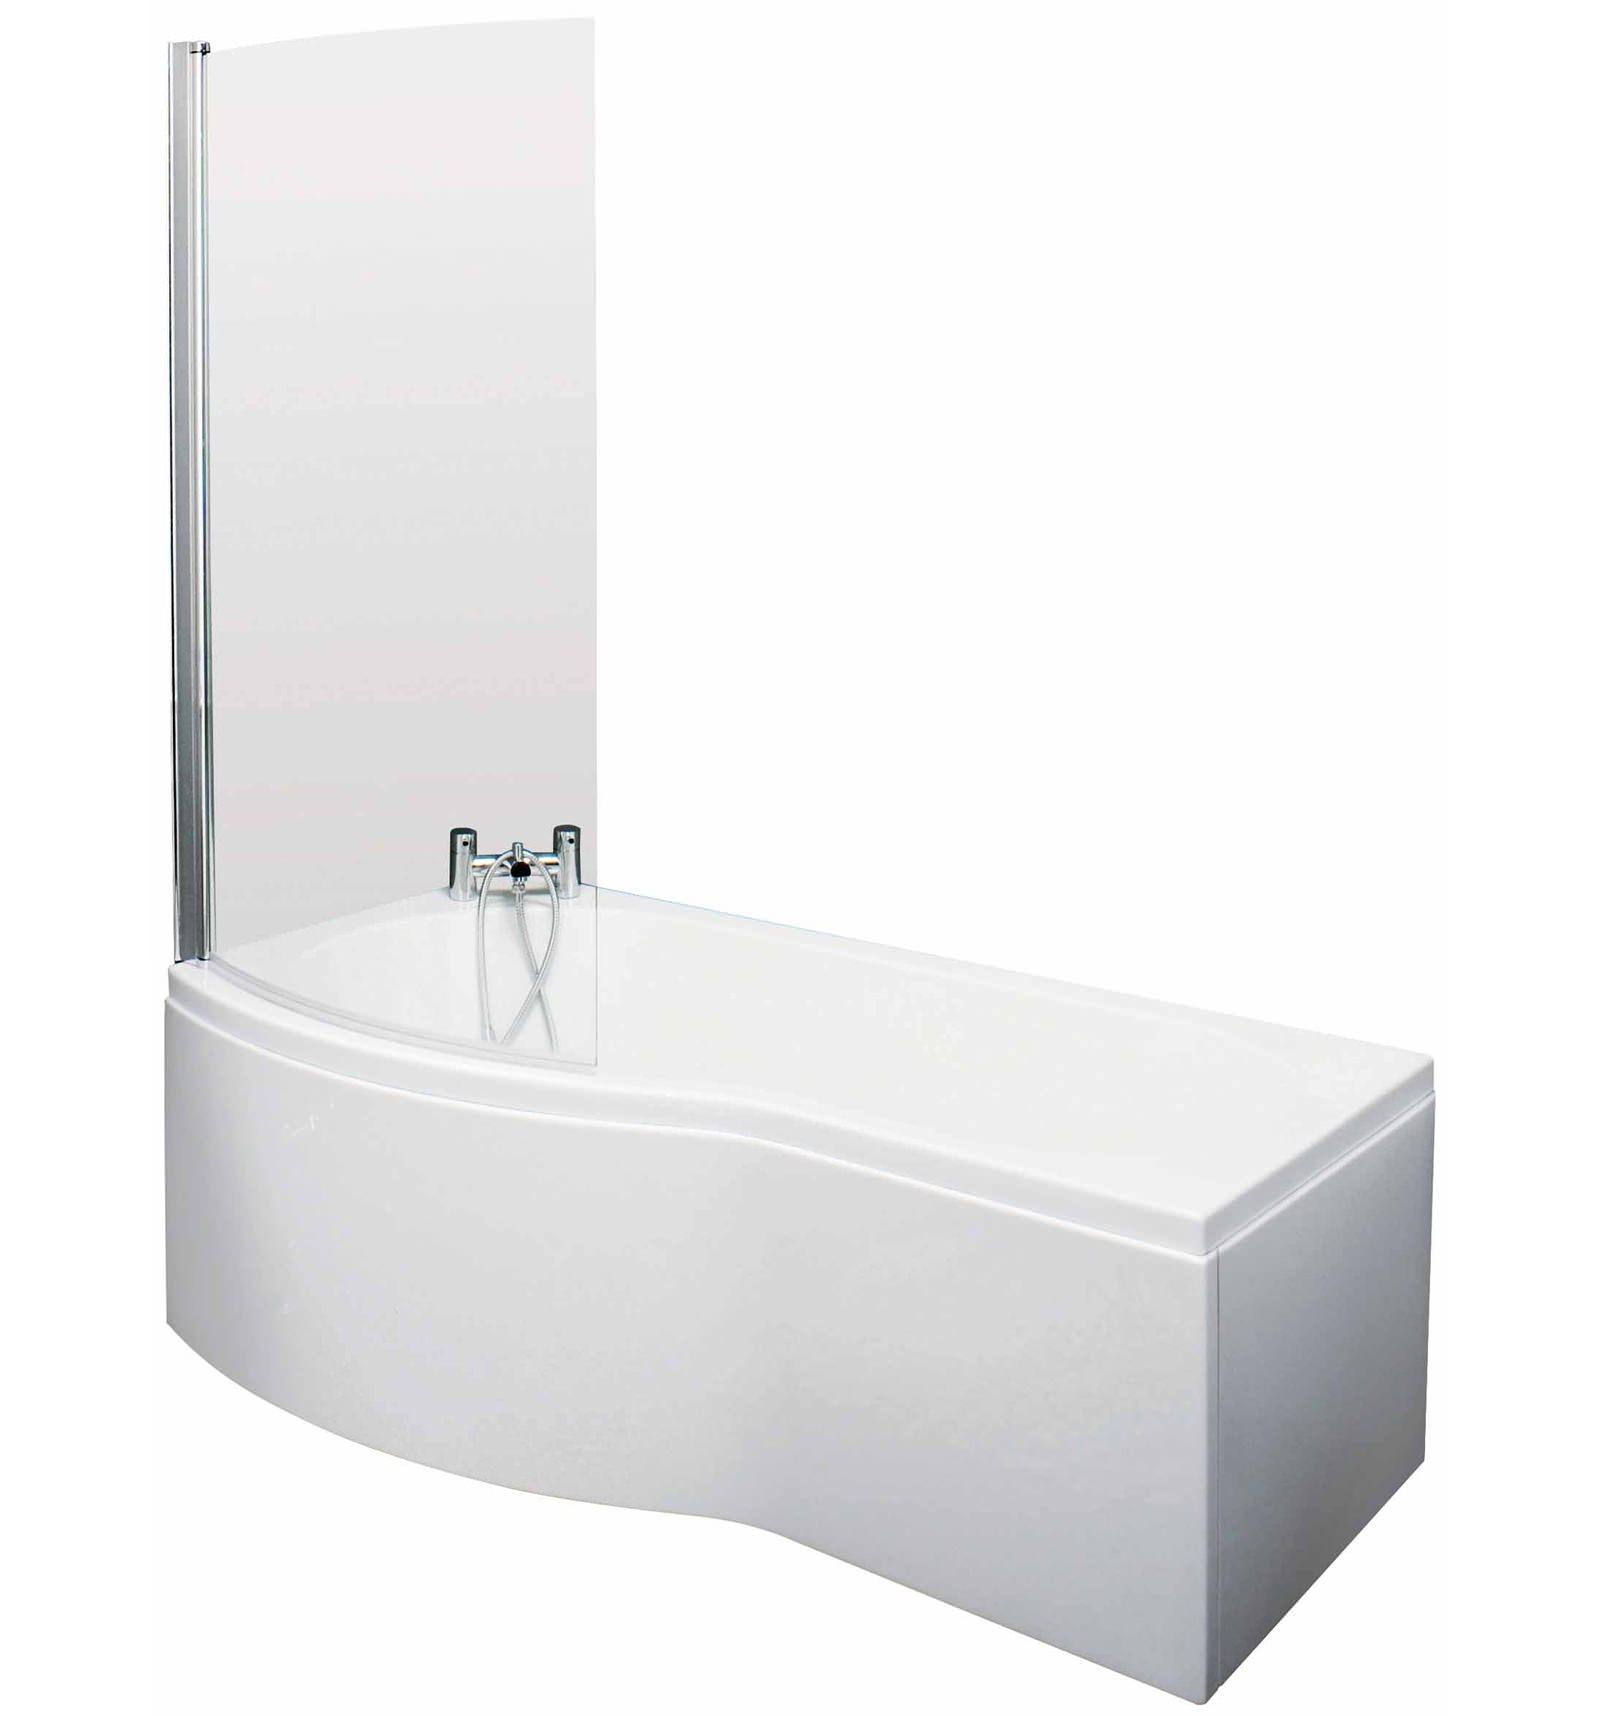 Lauren Curved B-Shaped 1700 x 900mm Left Acrylic Shower Bath Pack